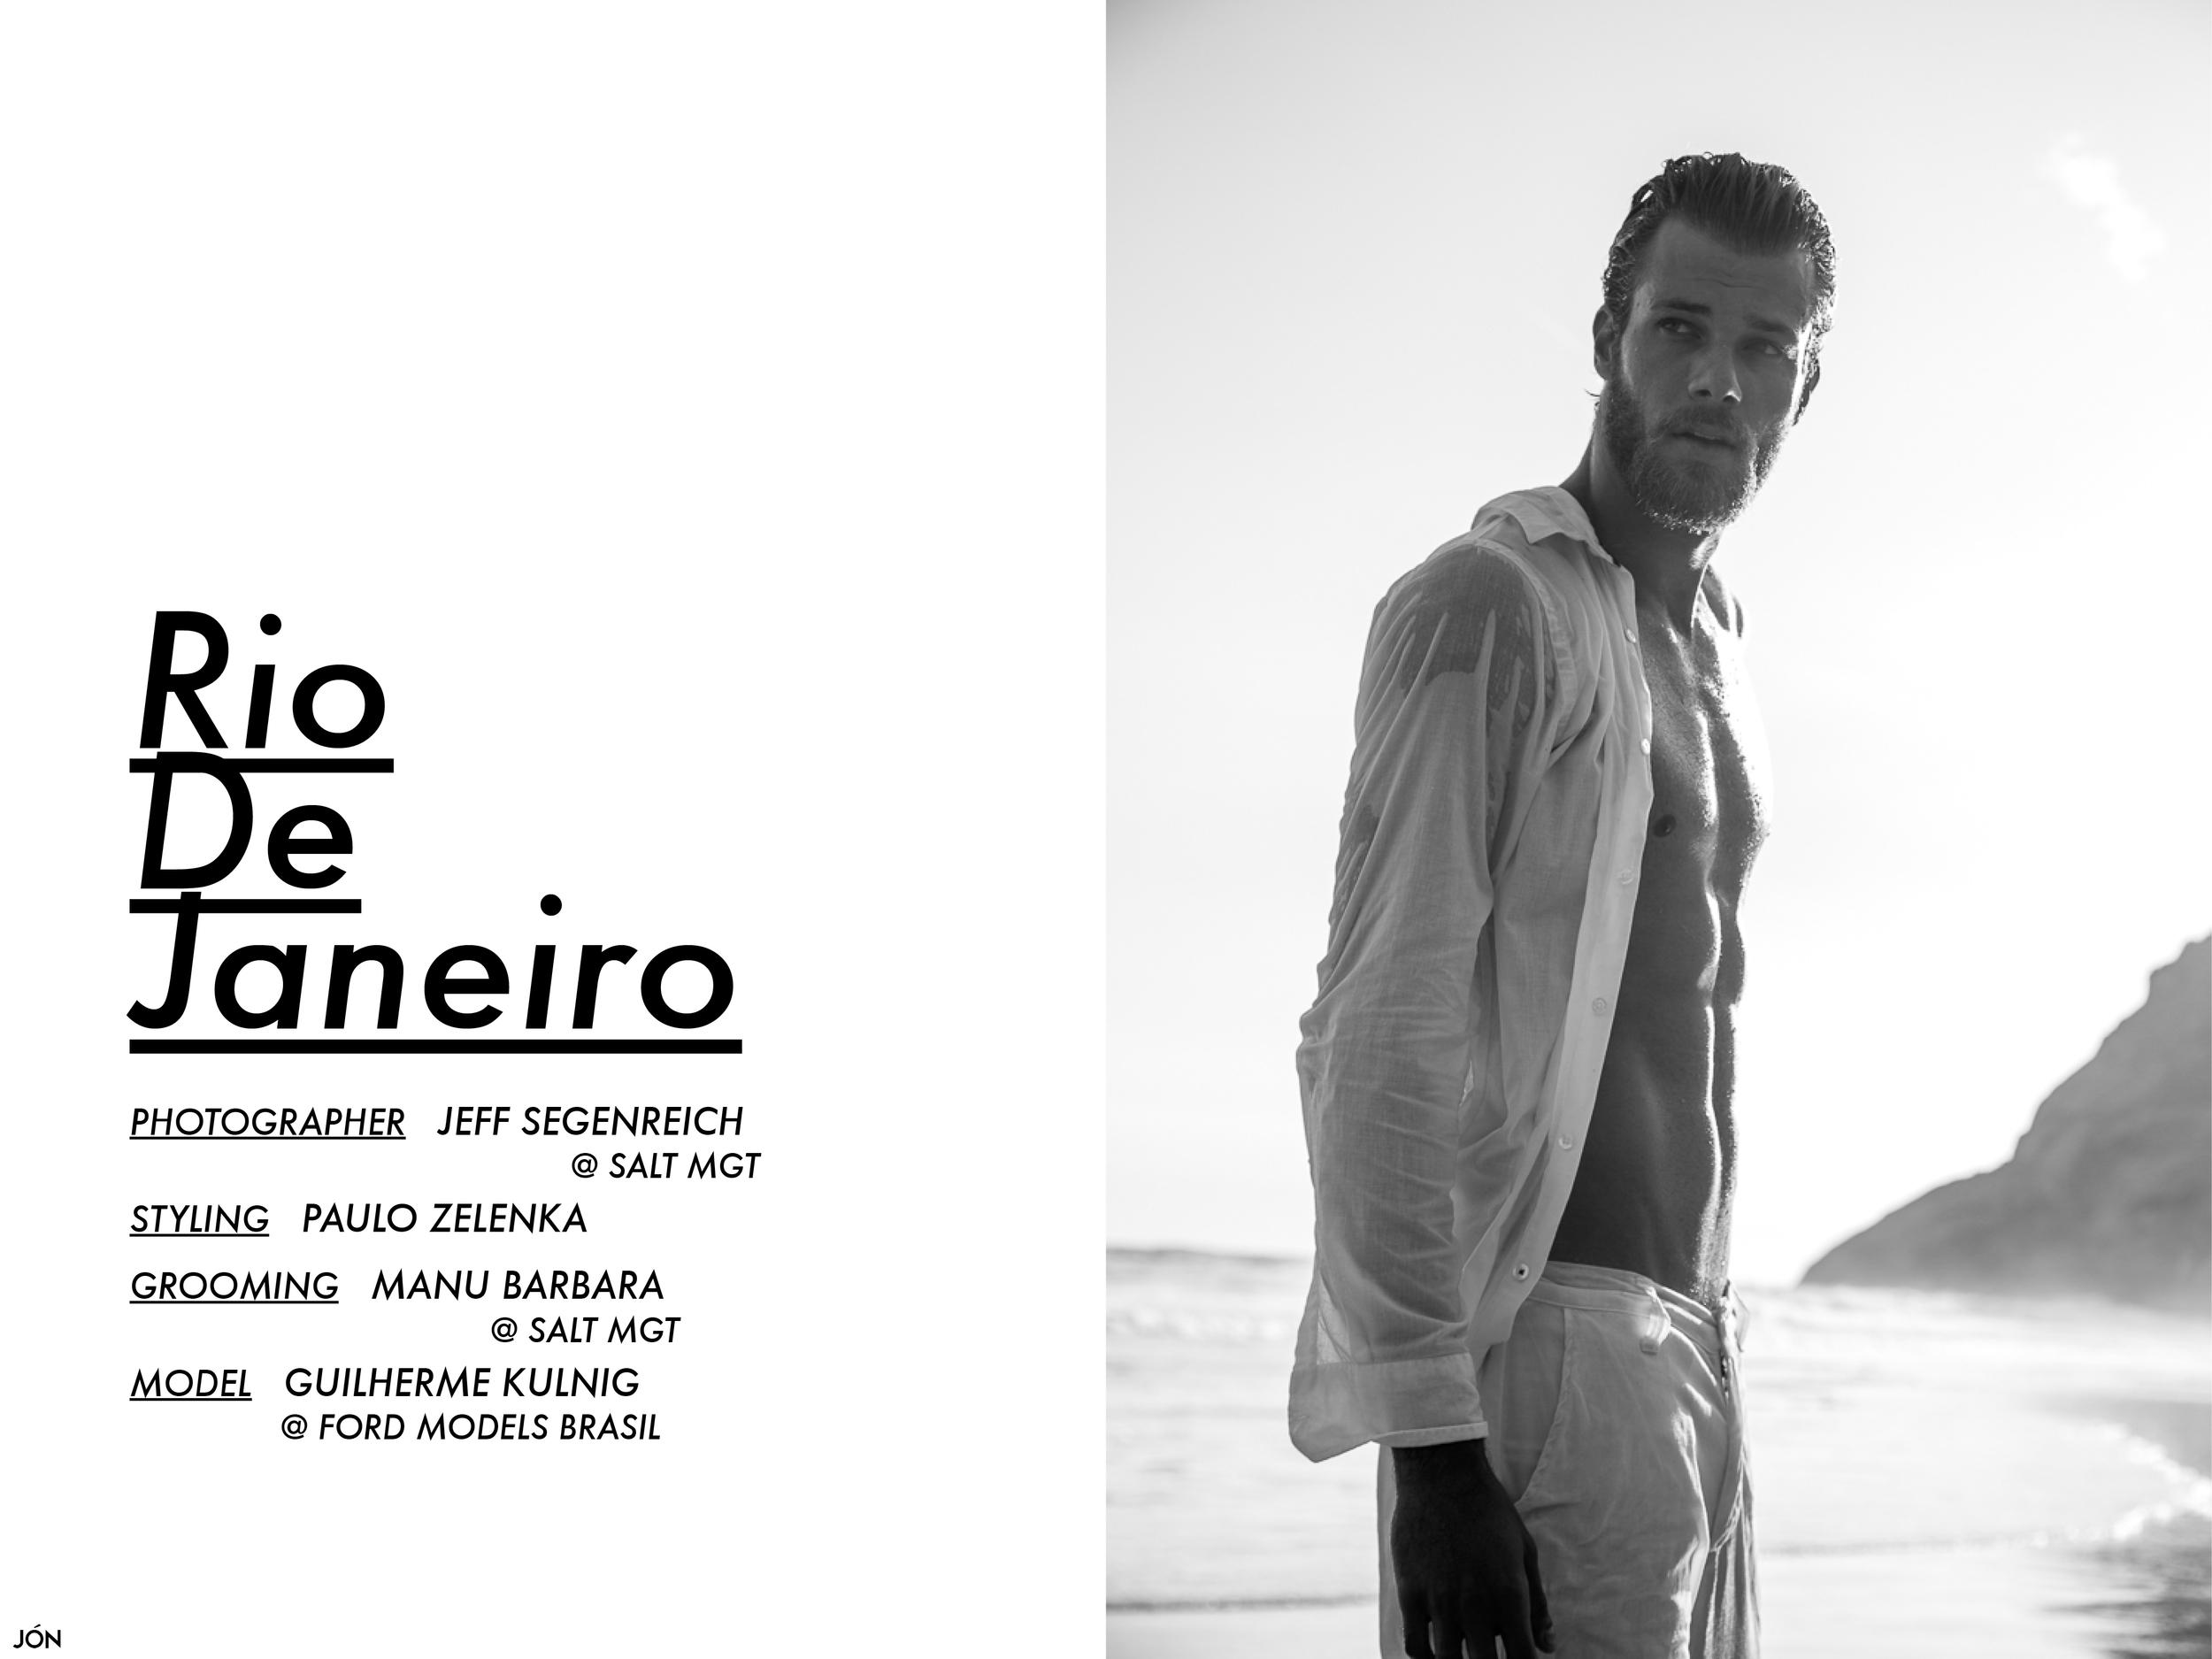 Shirt and trousers by Ermenegildo   Zega